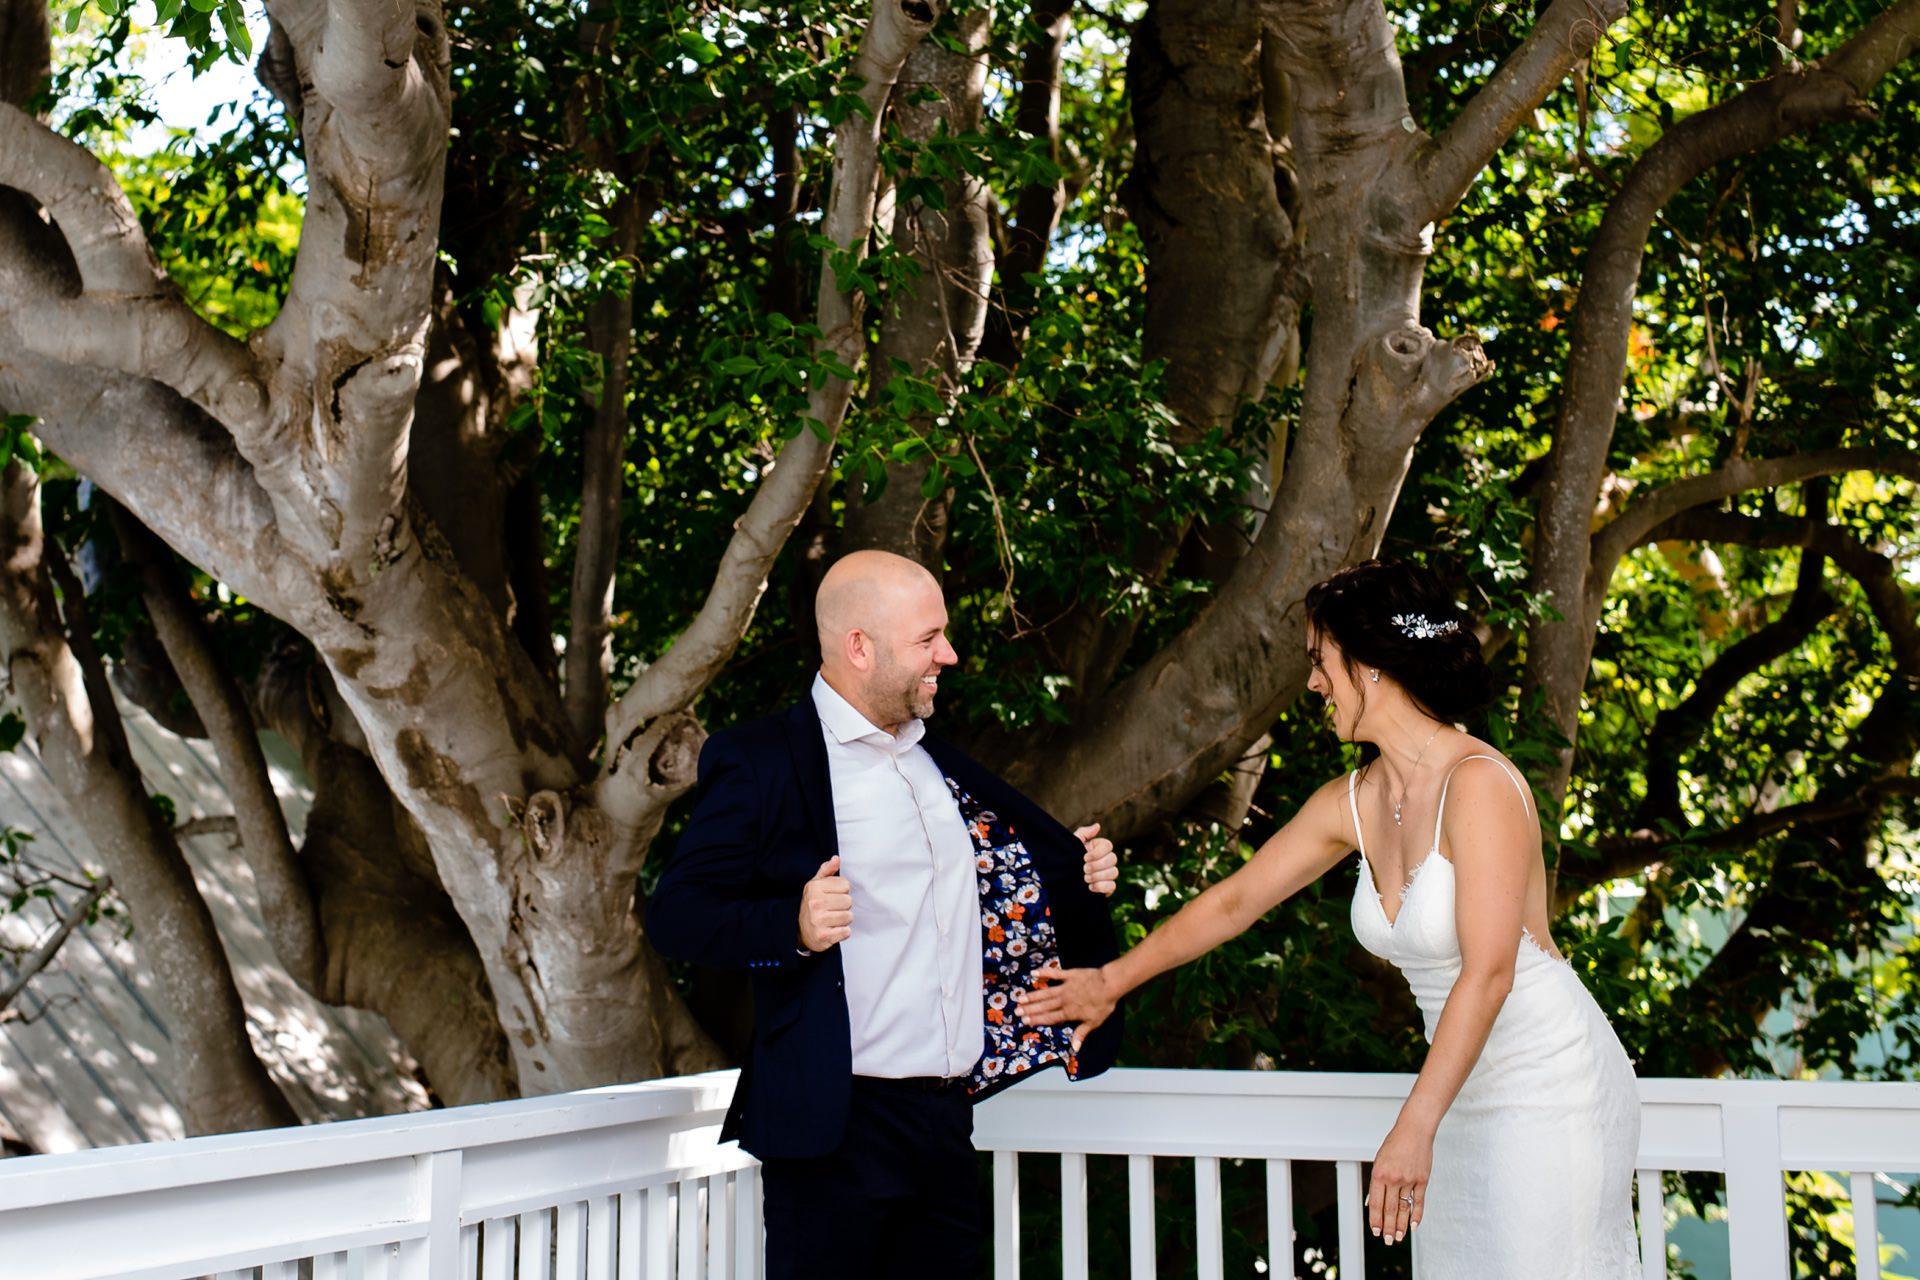 Bride touching her groom's suit jacket.